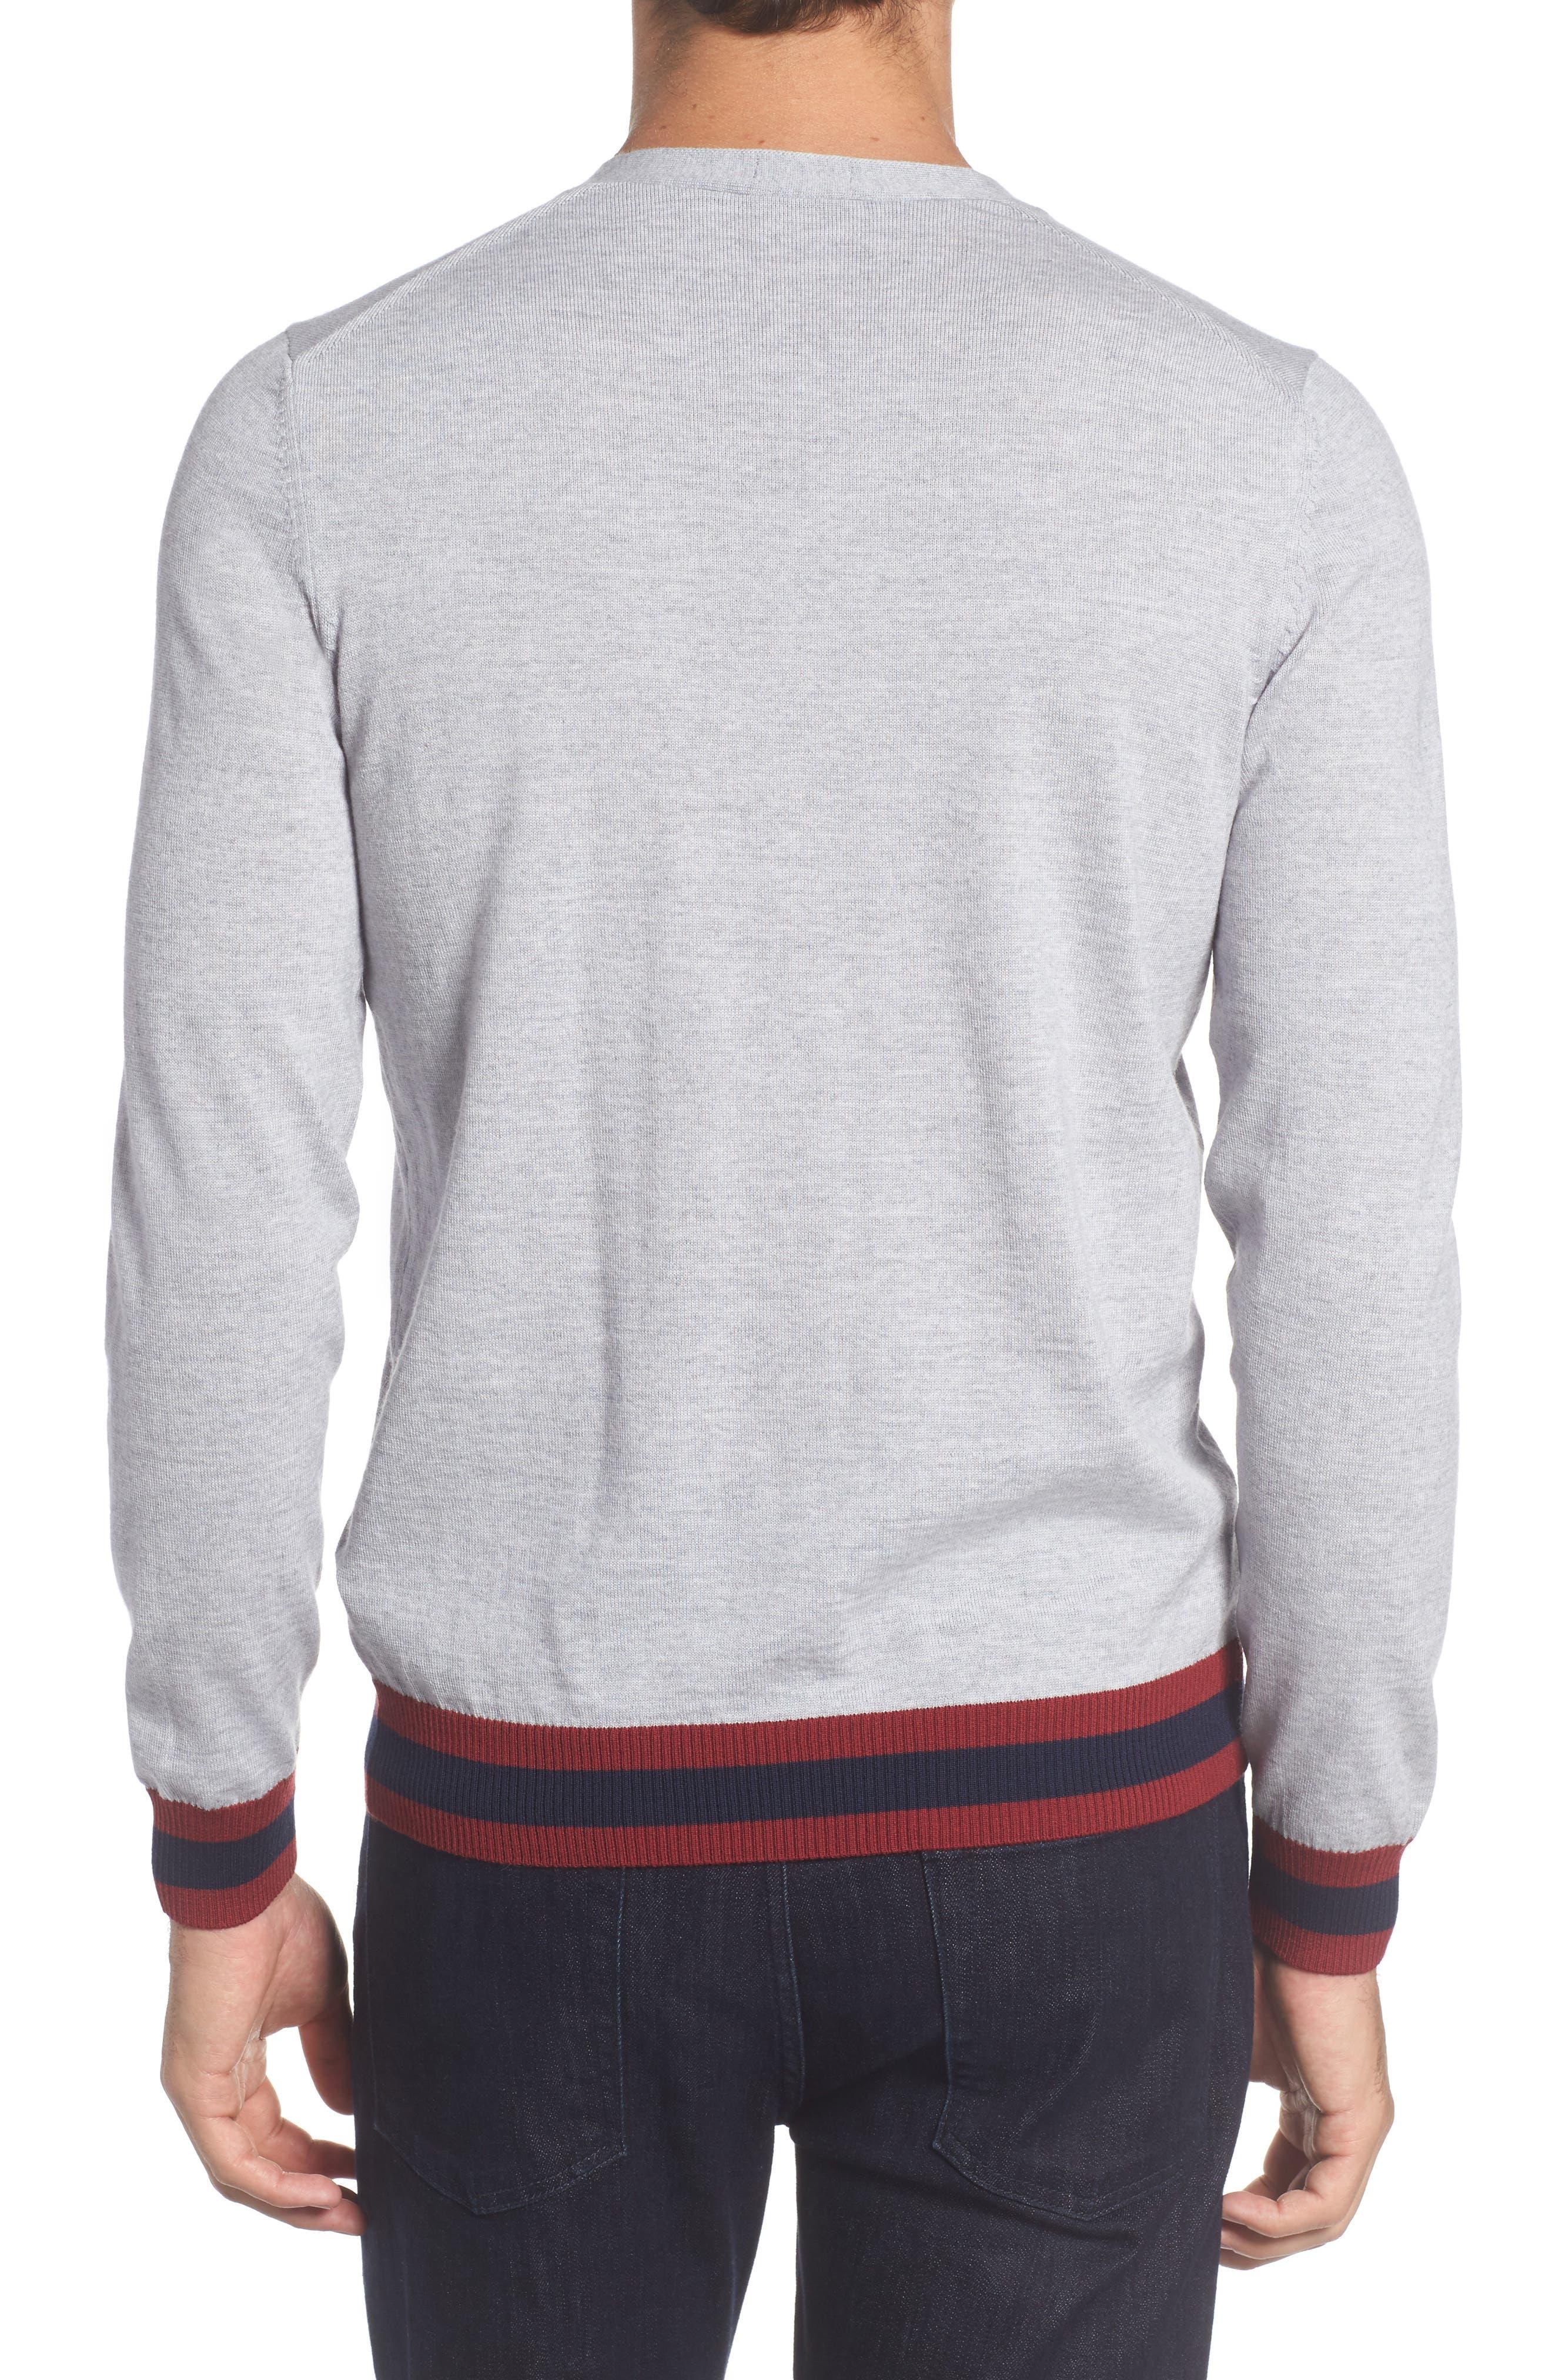 Navello Slim Fit Wool V-Neck Sweater,                             Alternate thumbnail 2, color,                             072